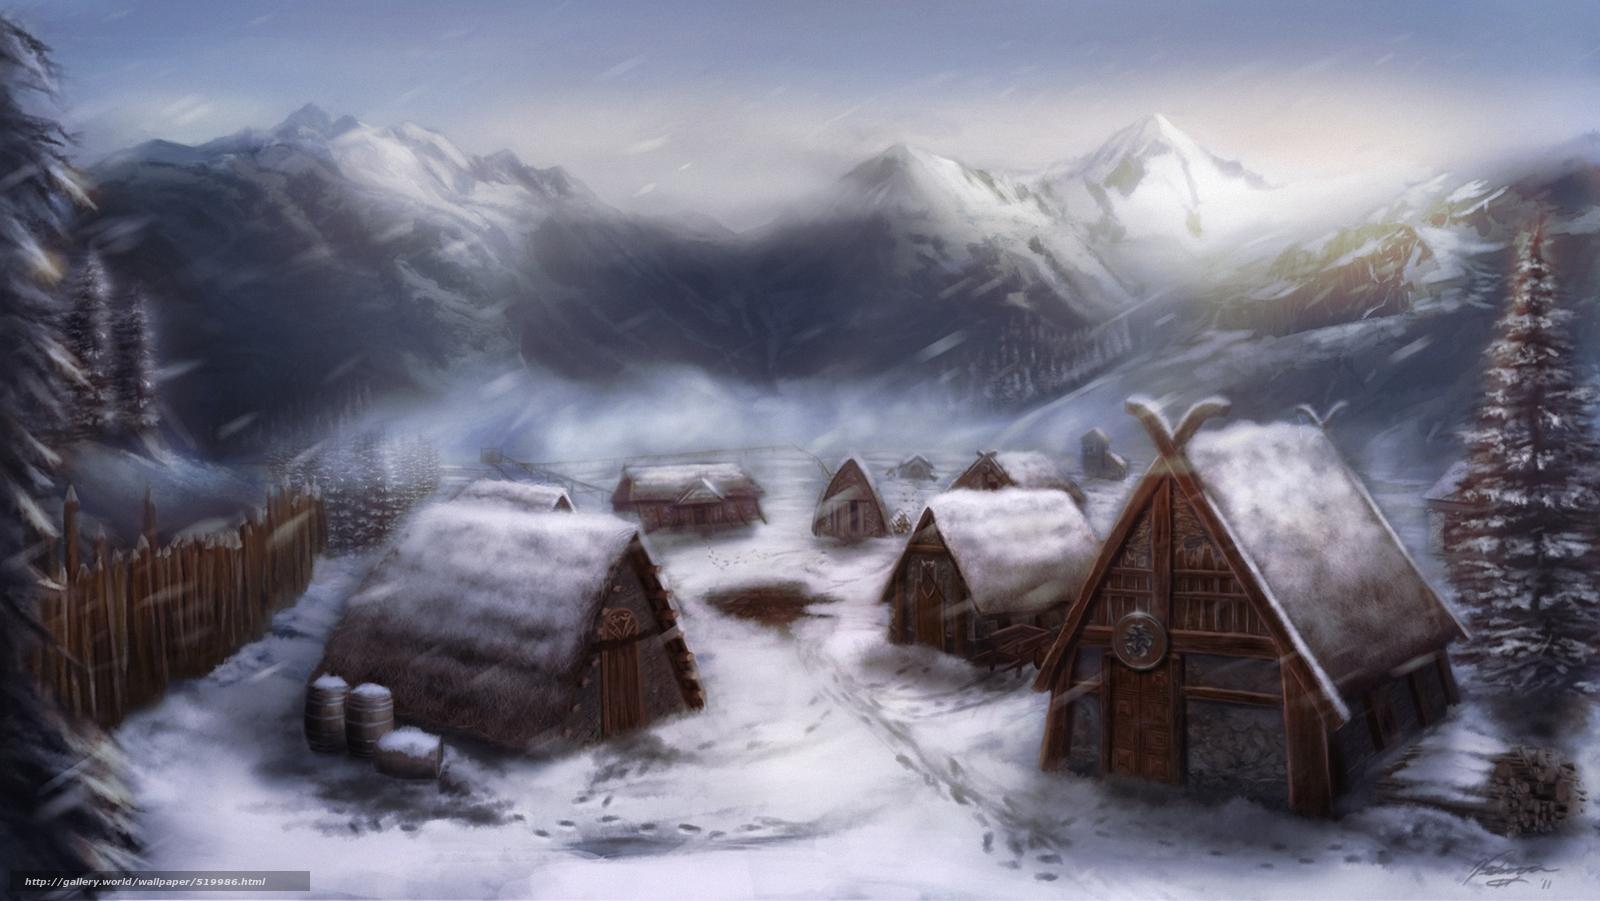 519986_derevnya_vikingi_doma_sneg_art_po